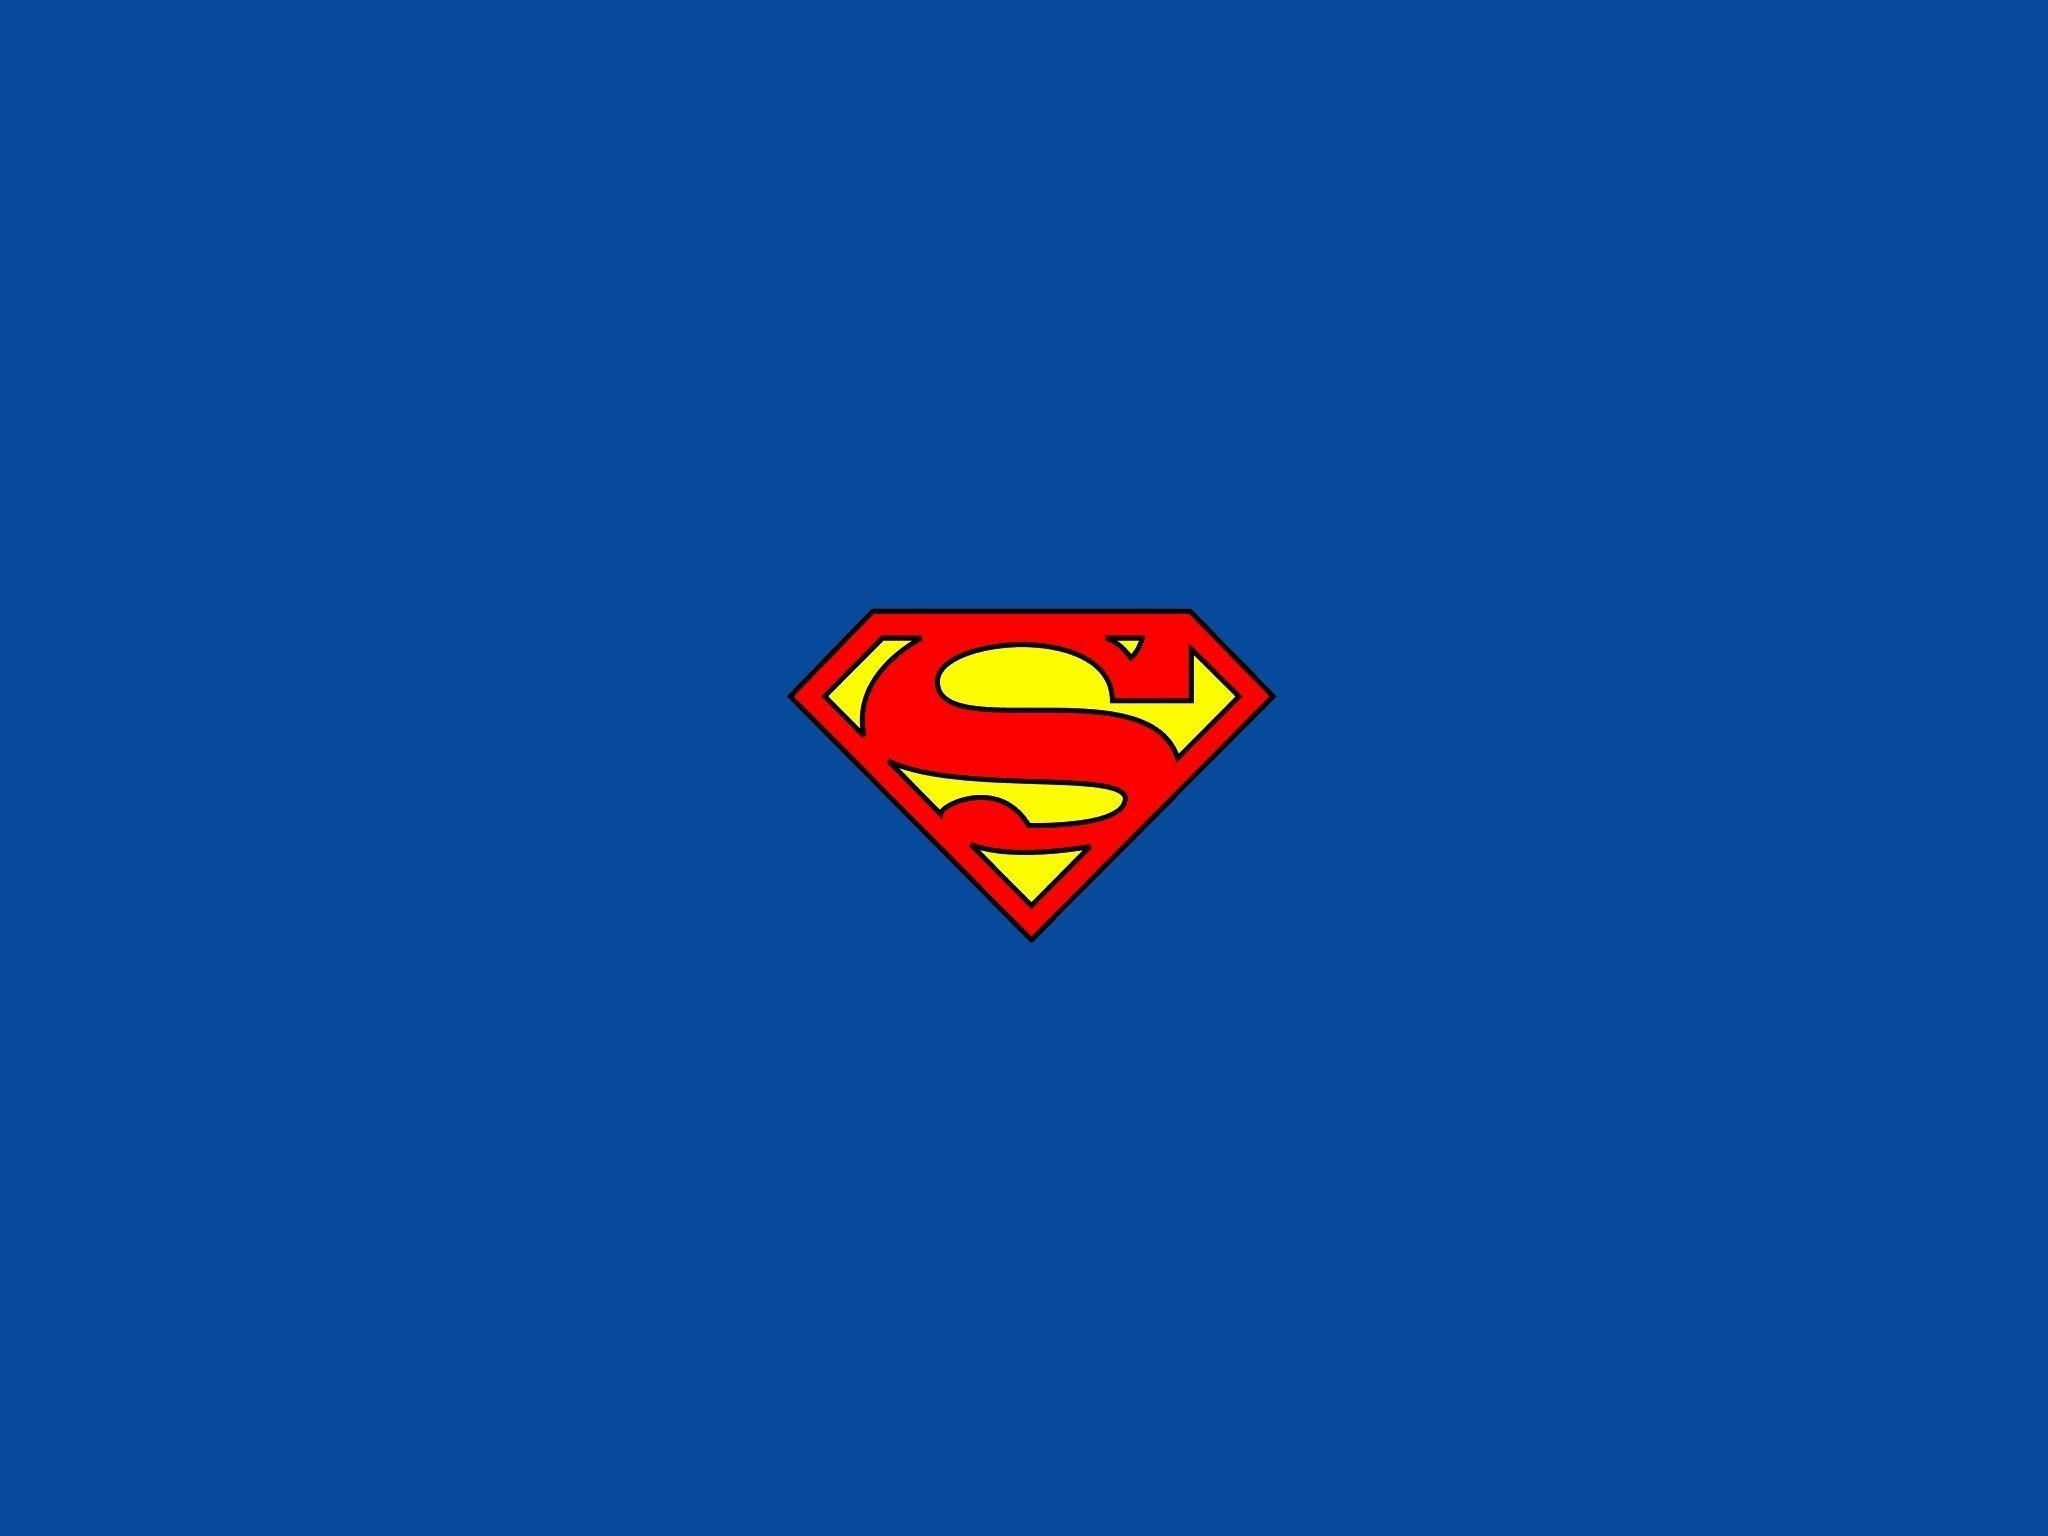 Superman Logo Wallpapers Hd As Wallpaper HD